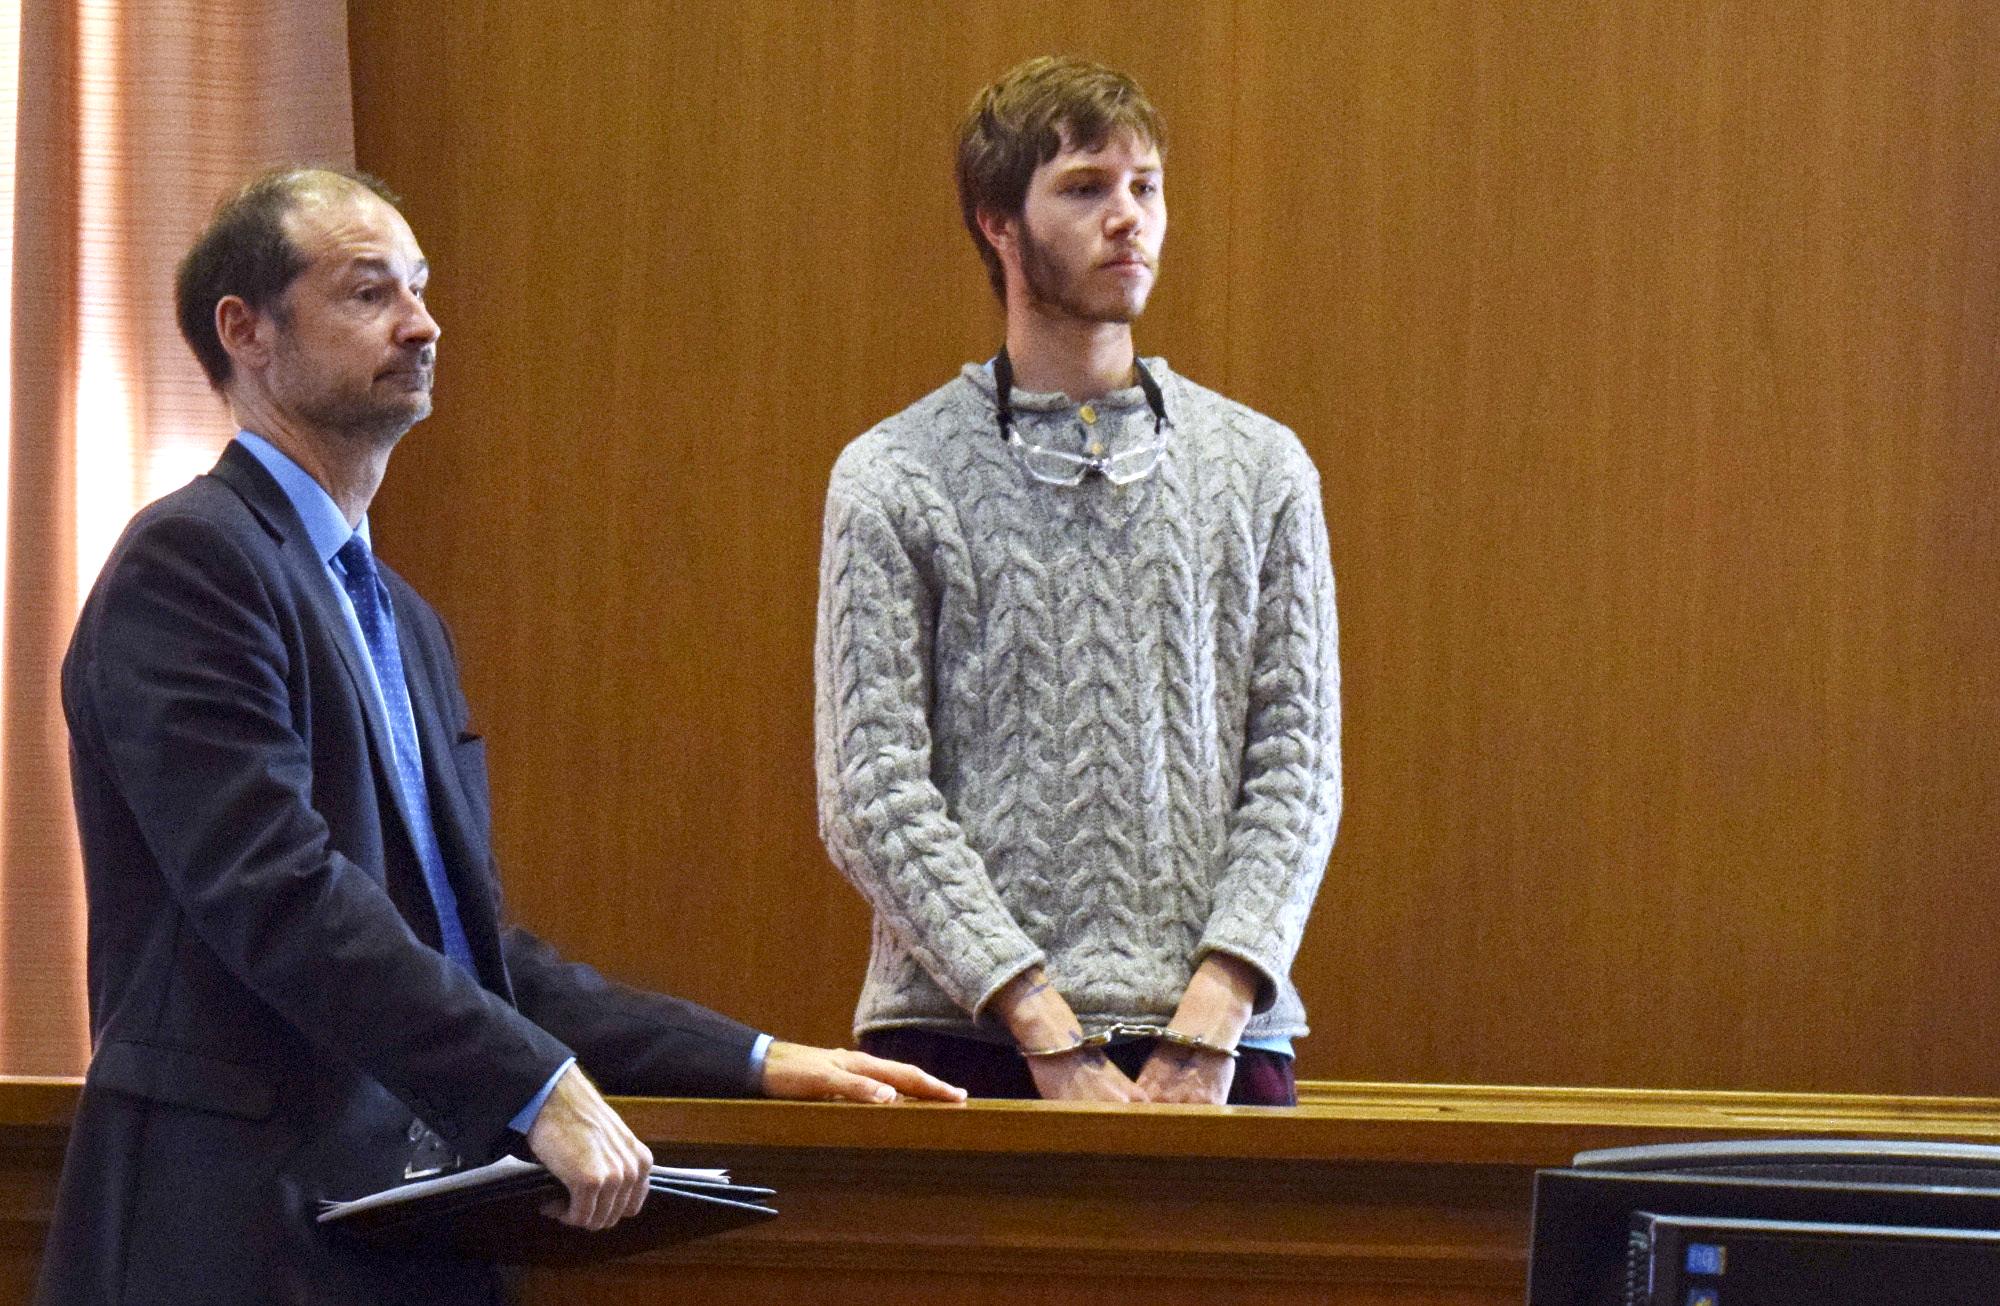 Man pleads guilty to 2017 quadruple-murder with baseball bat in Massachusetts